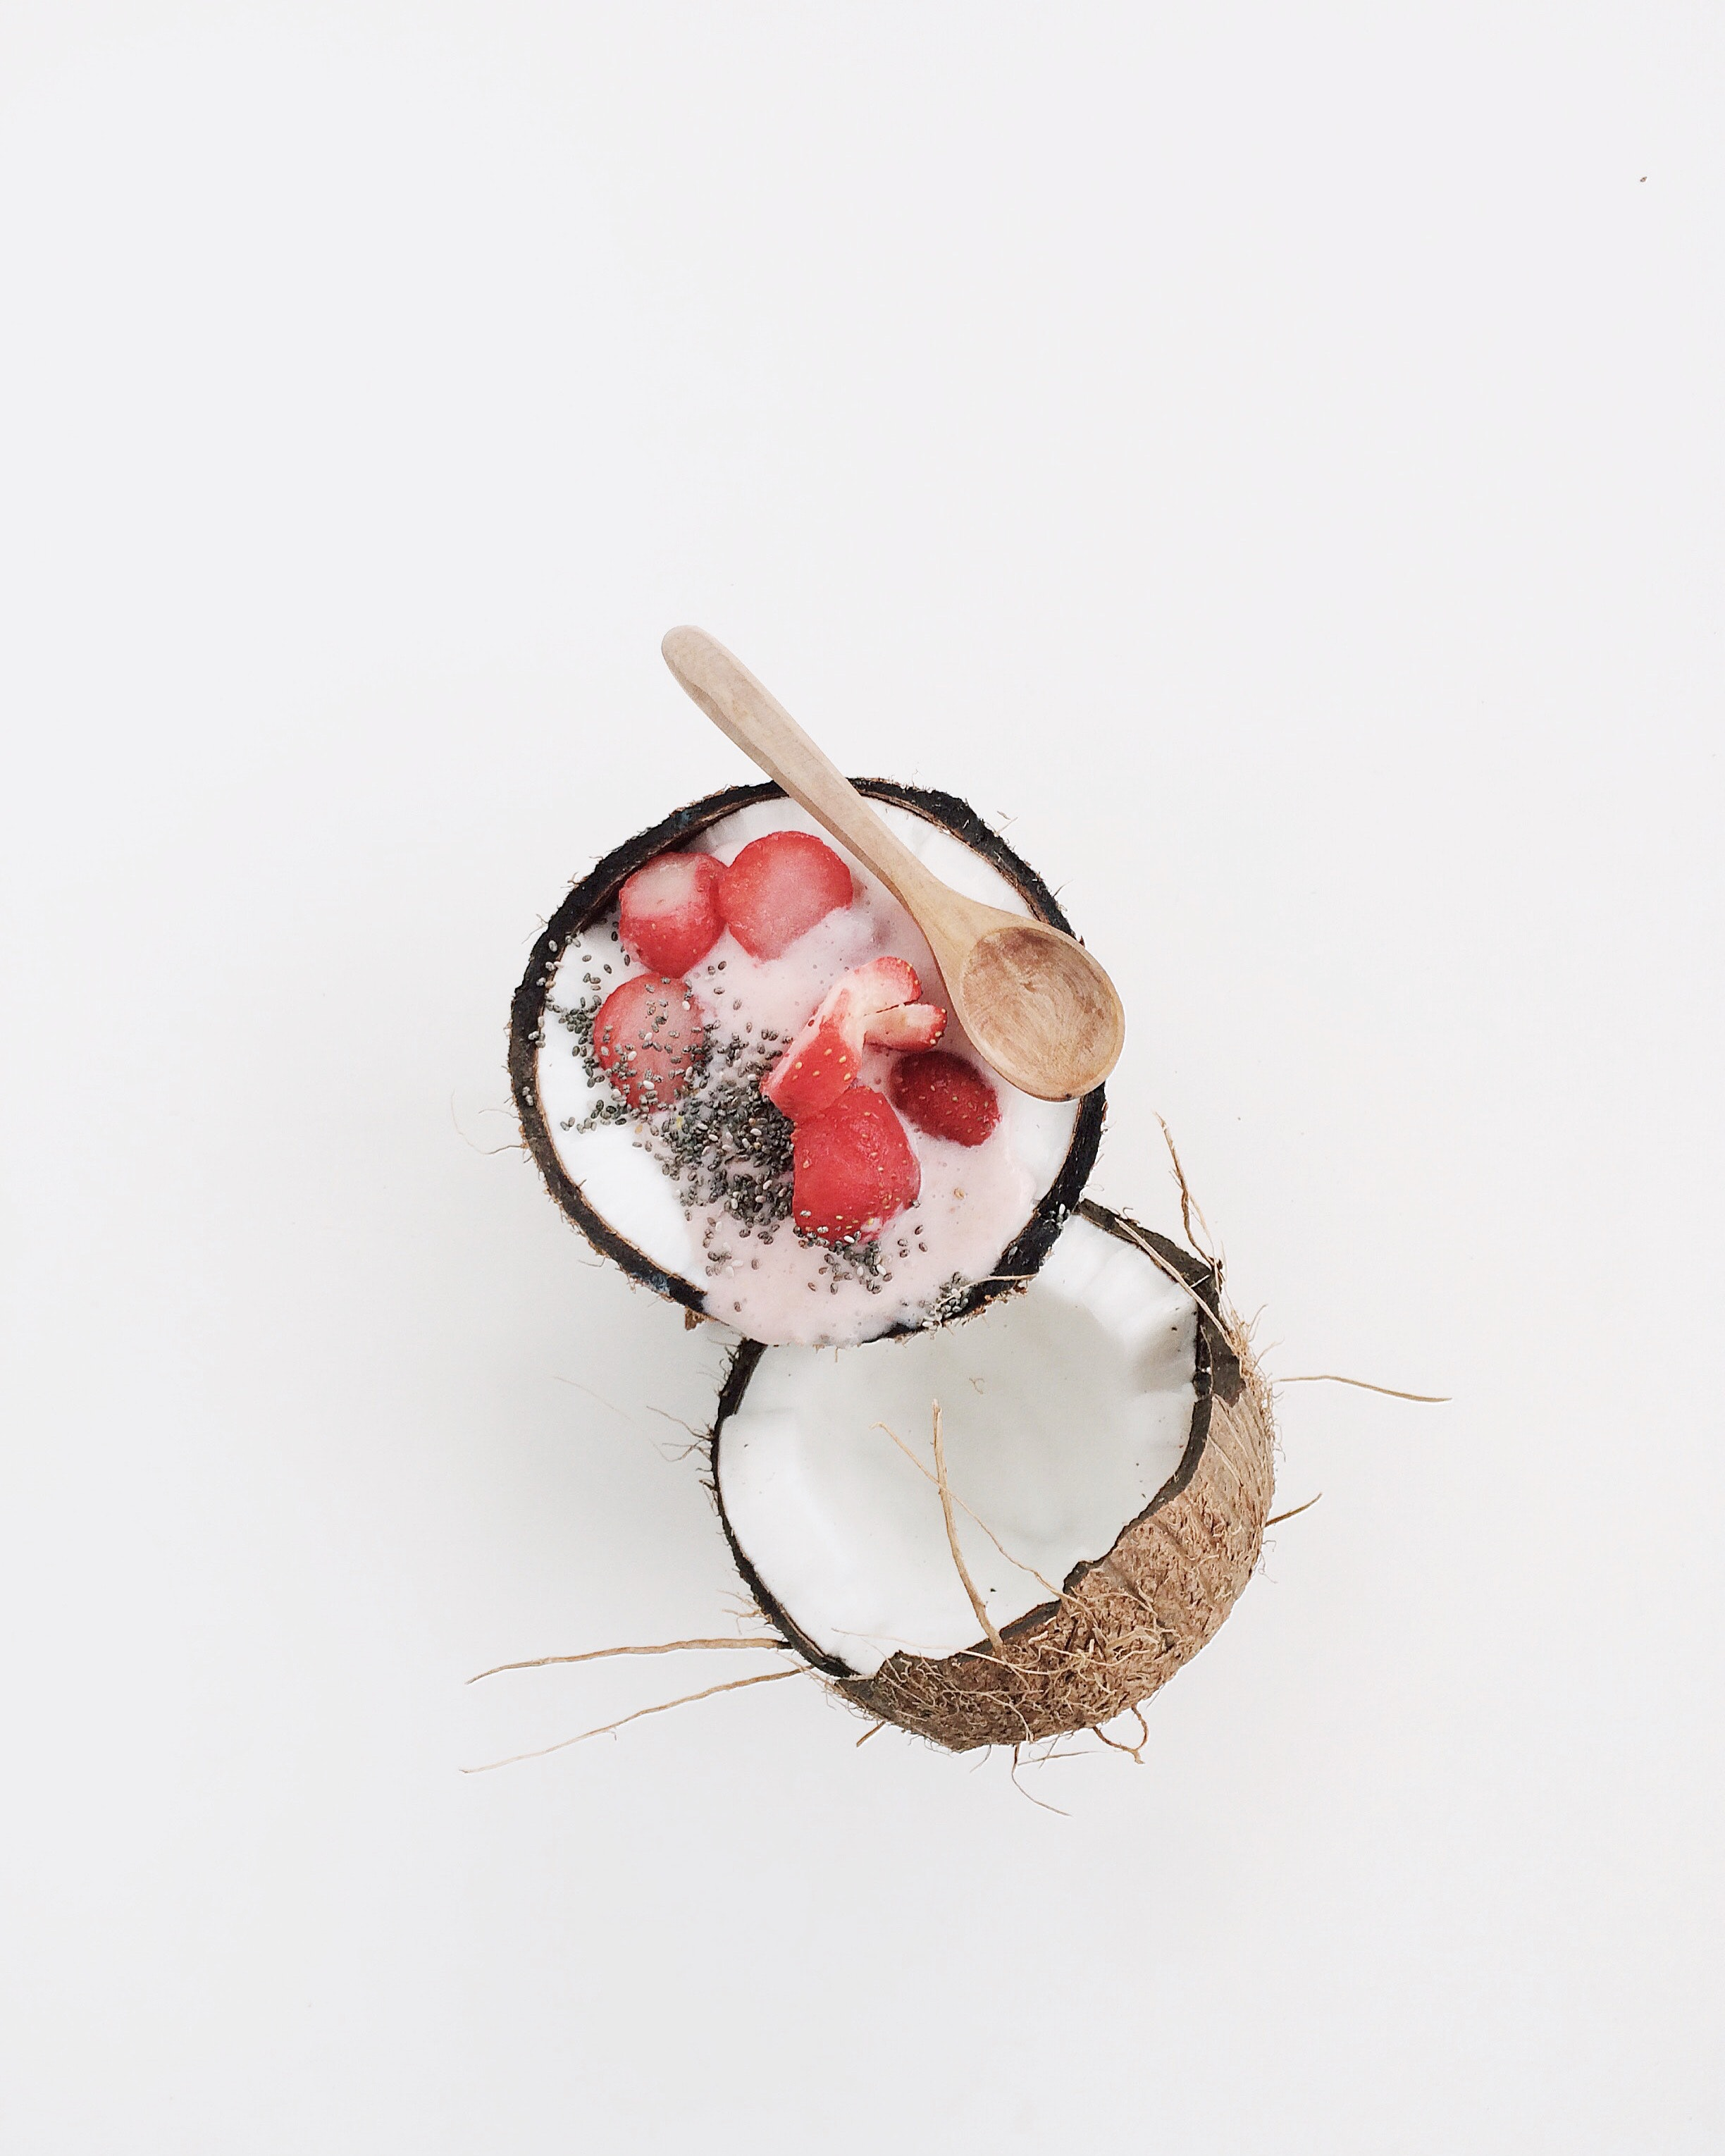 berries-berry-chia-1030973.jpg